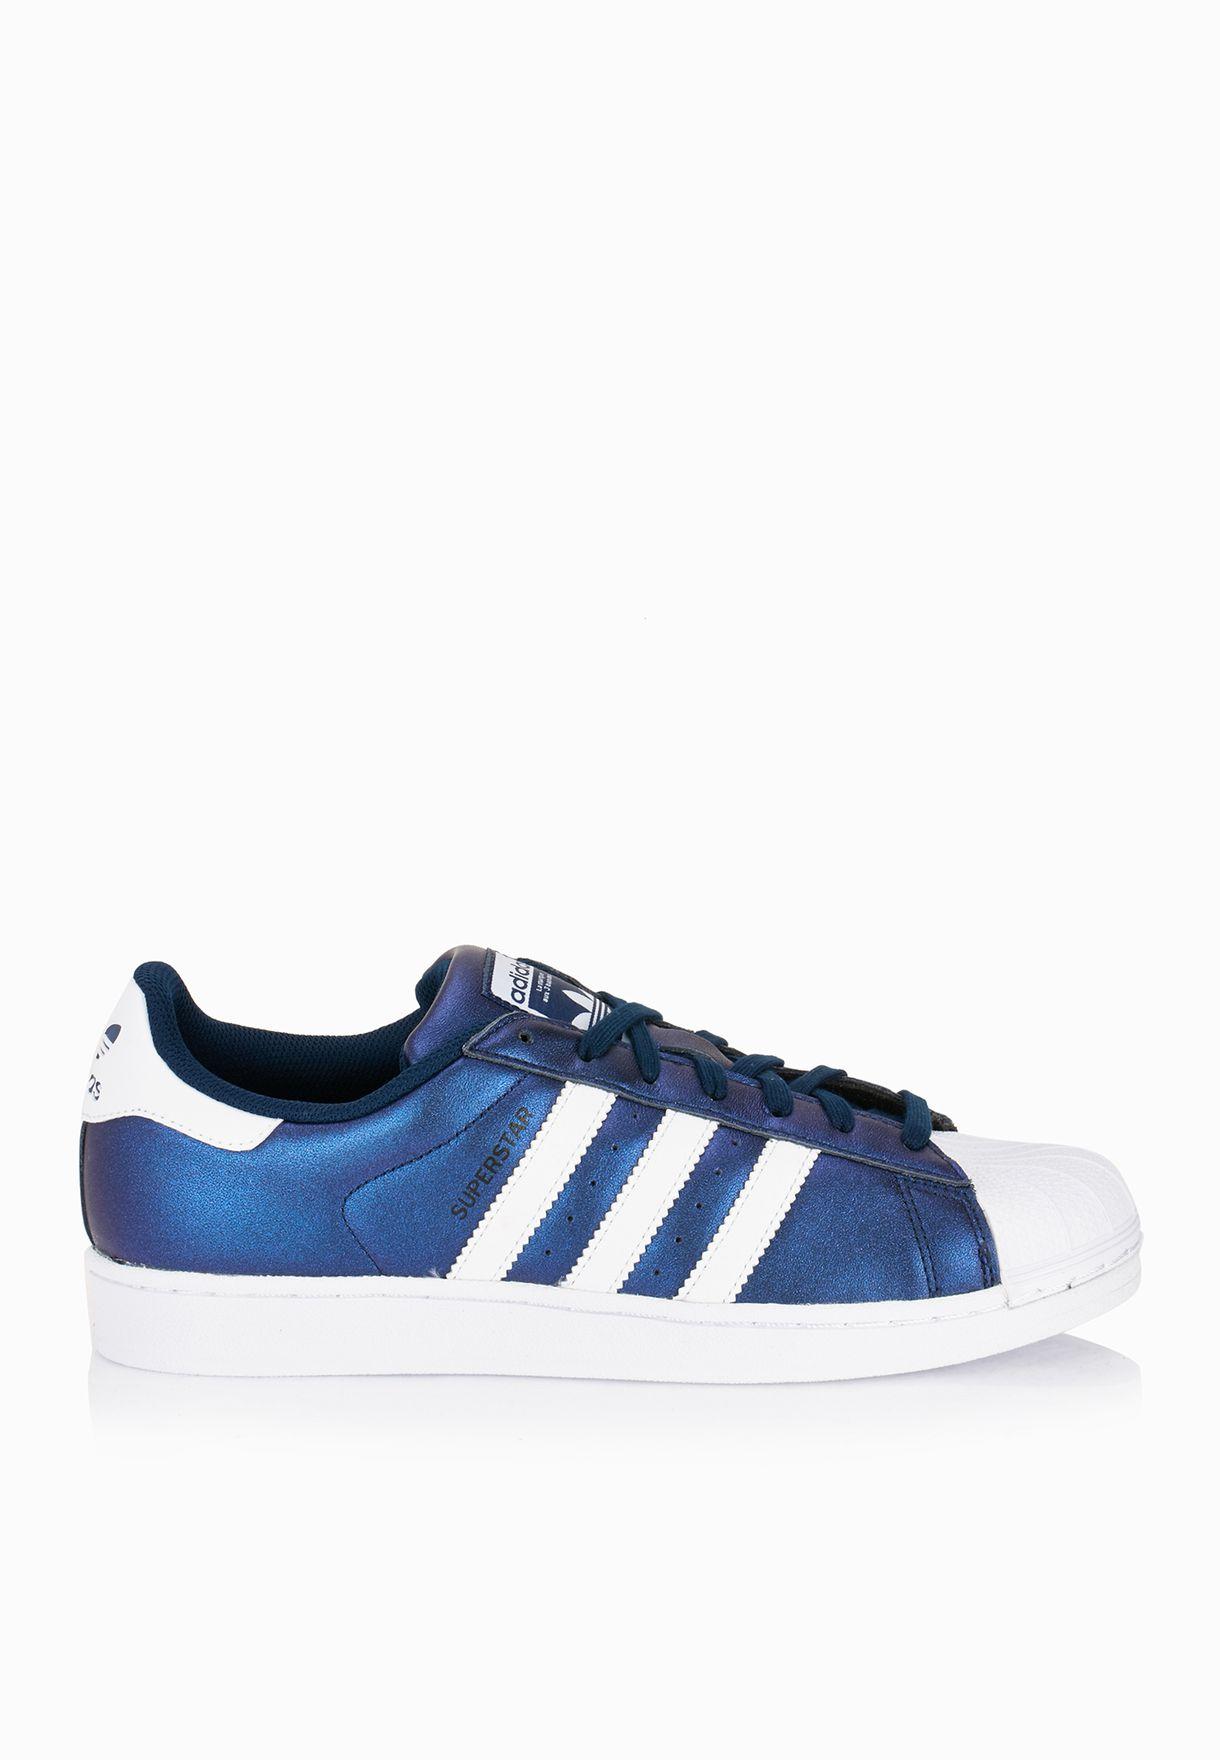 Adidas Superstar Hologram Shoes AB Swarovski Custom